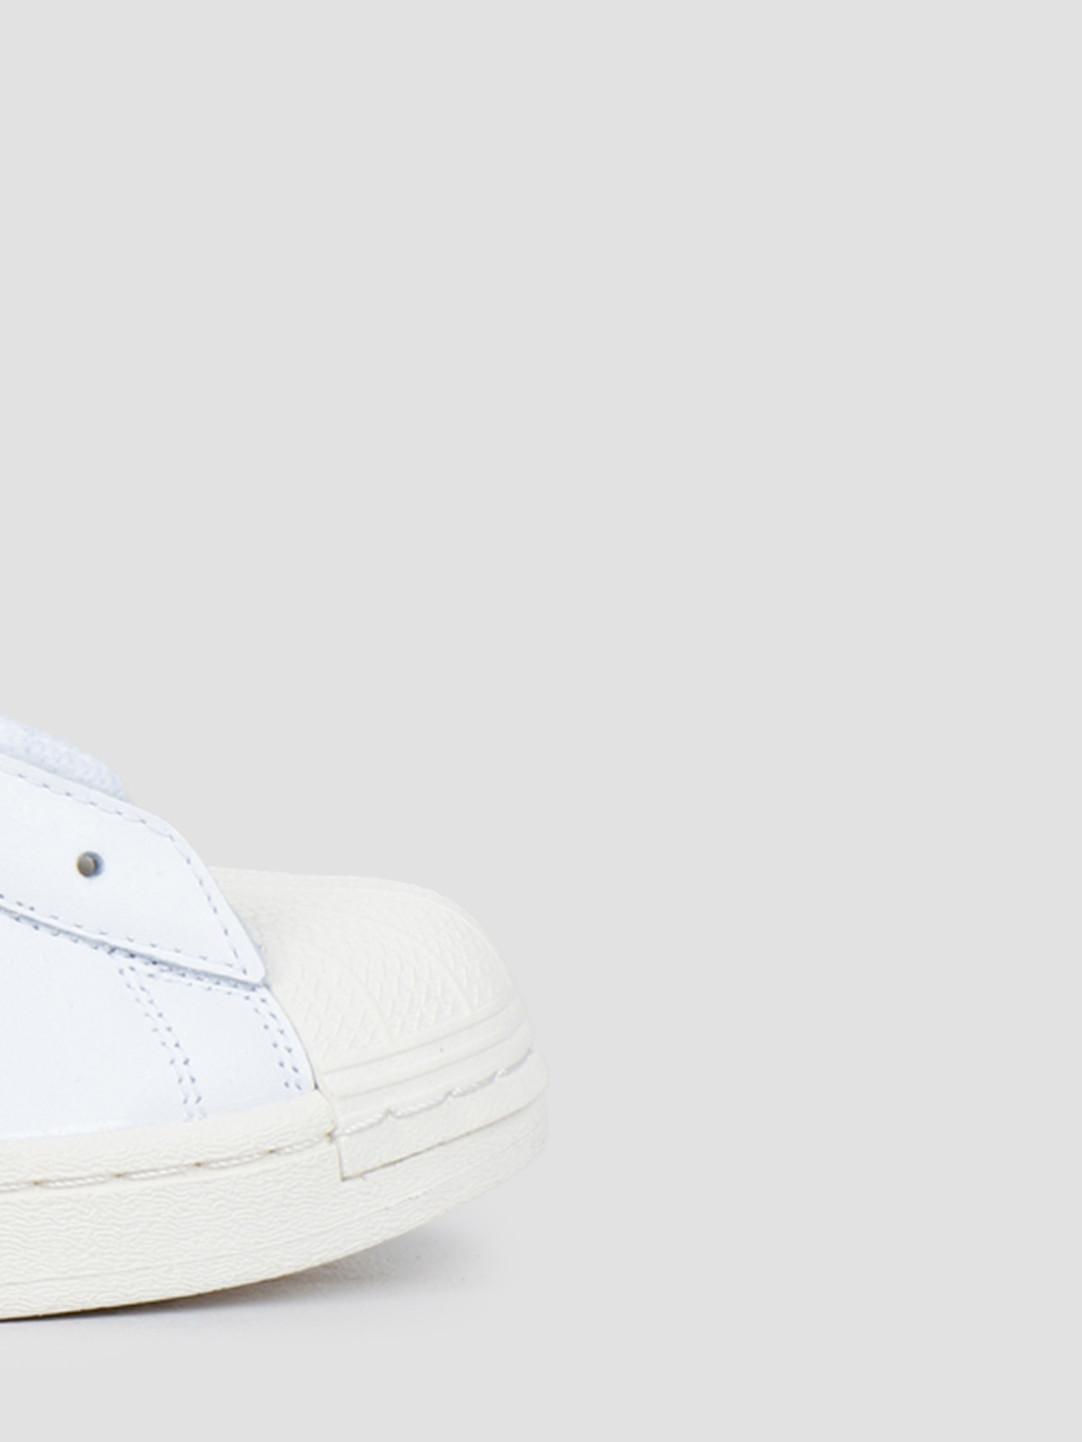 adidas adidas Superstar Laceless Footwear White Core Black Footwear White FV3017